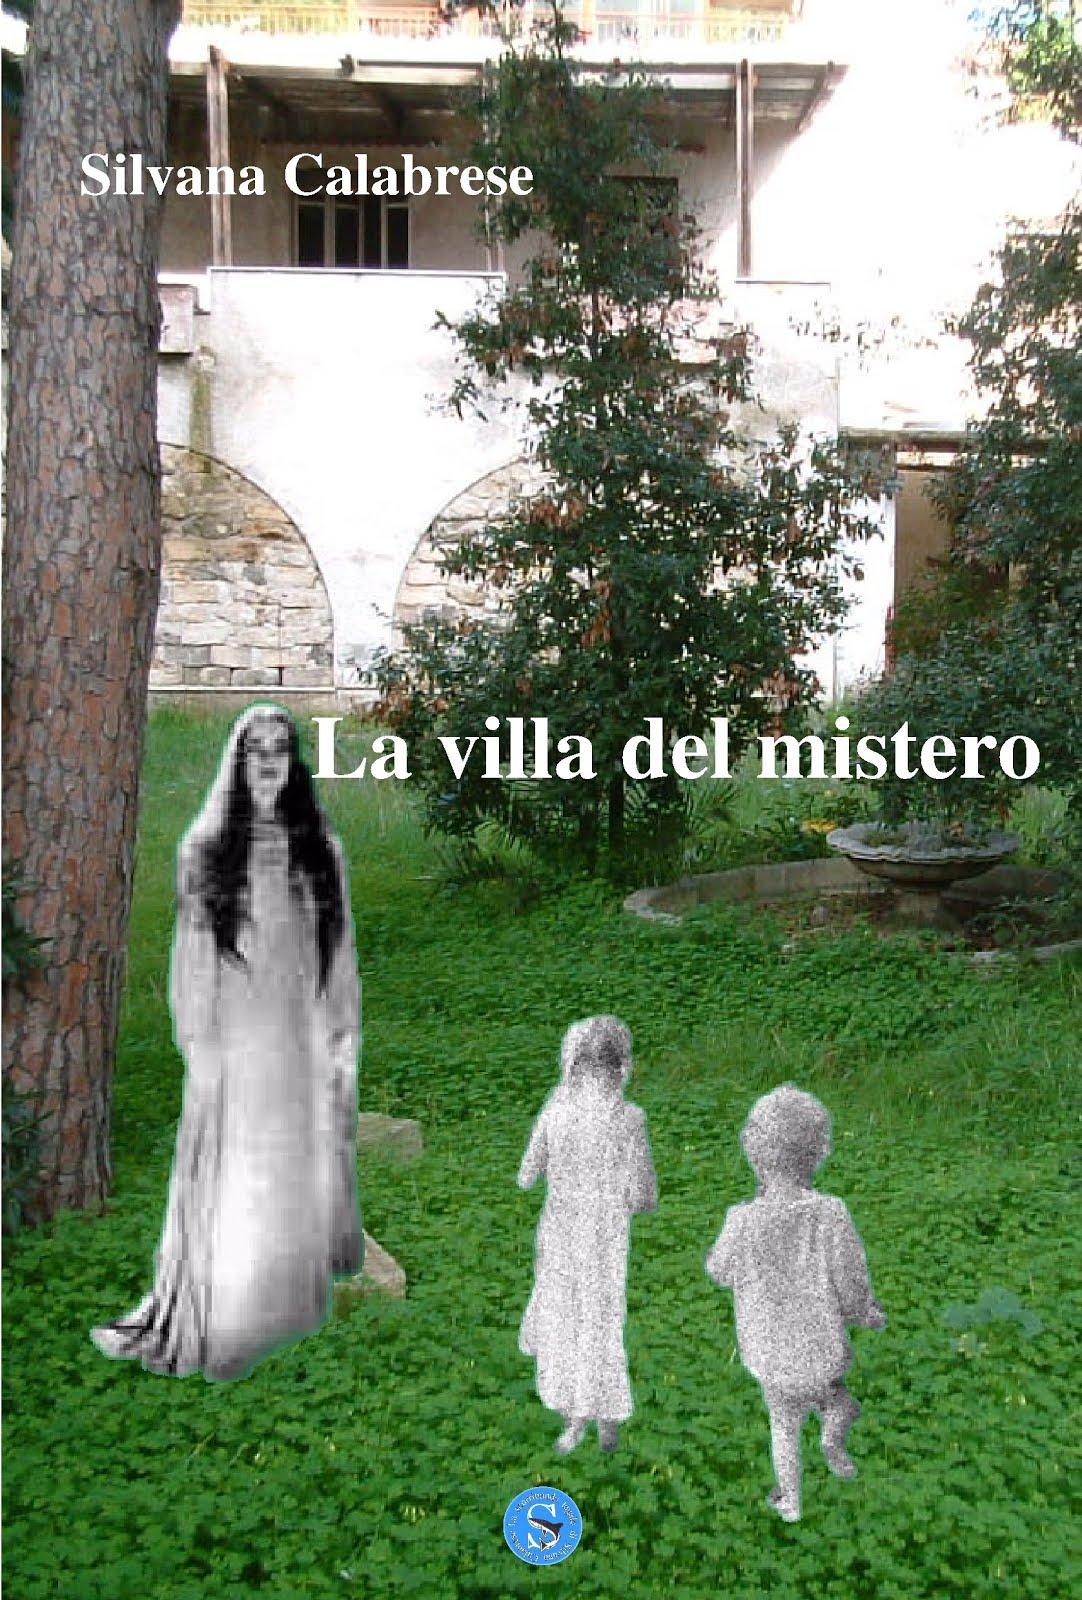 La villa del mistero